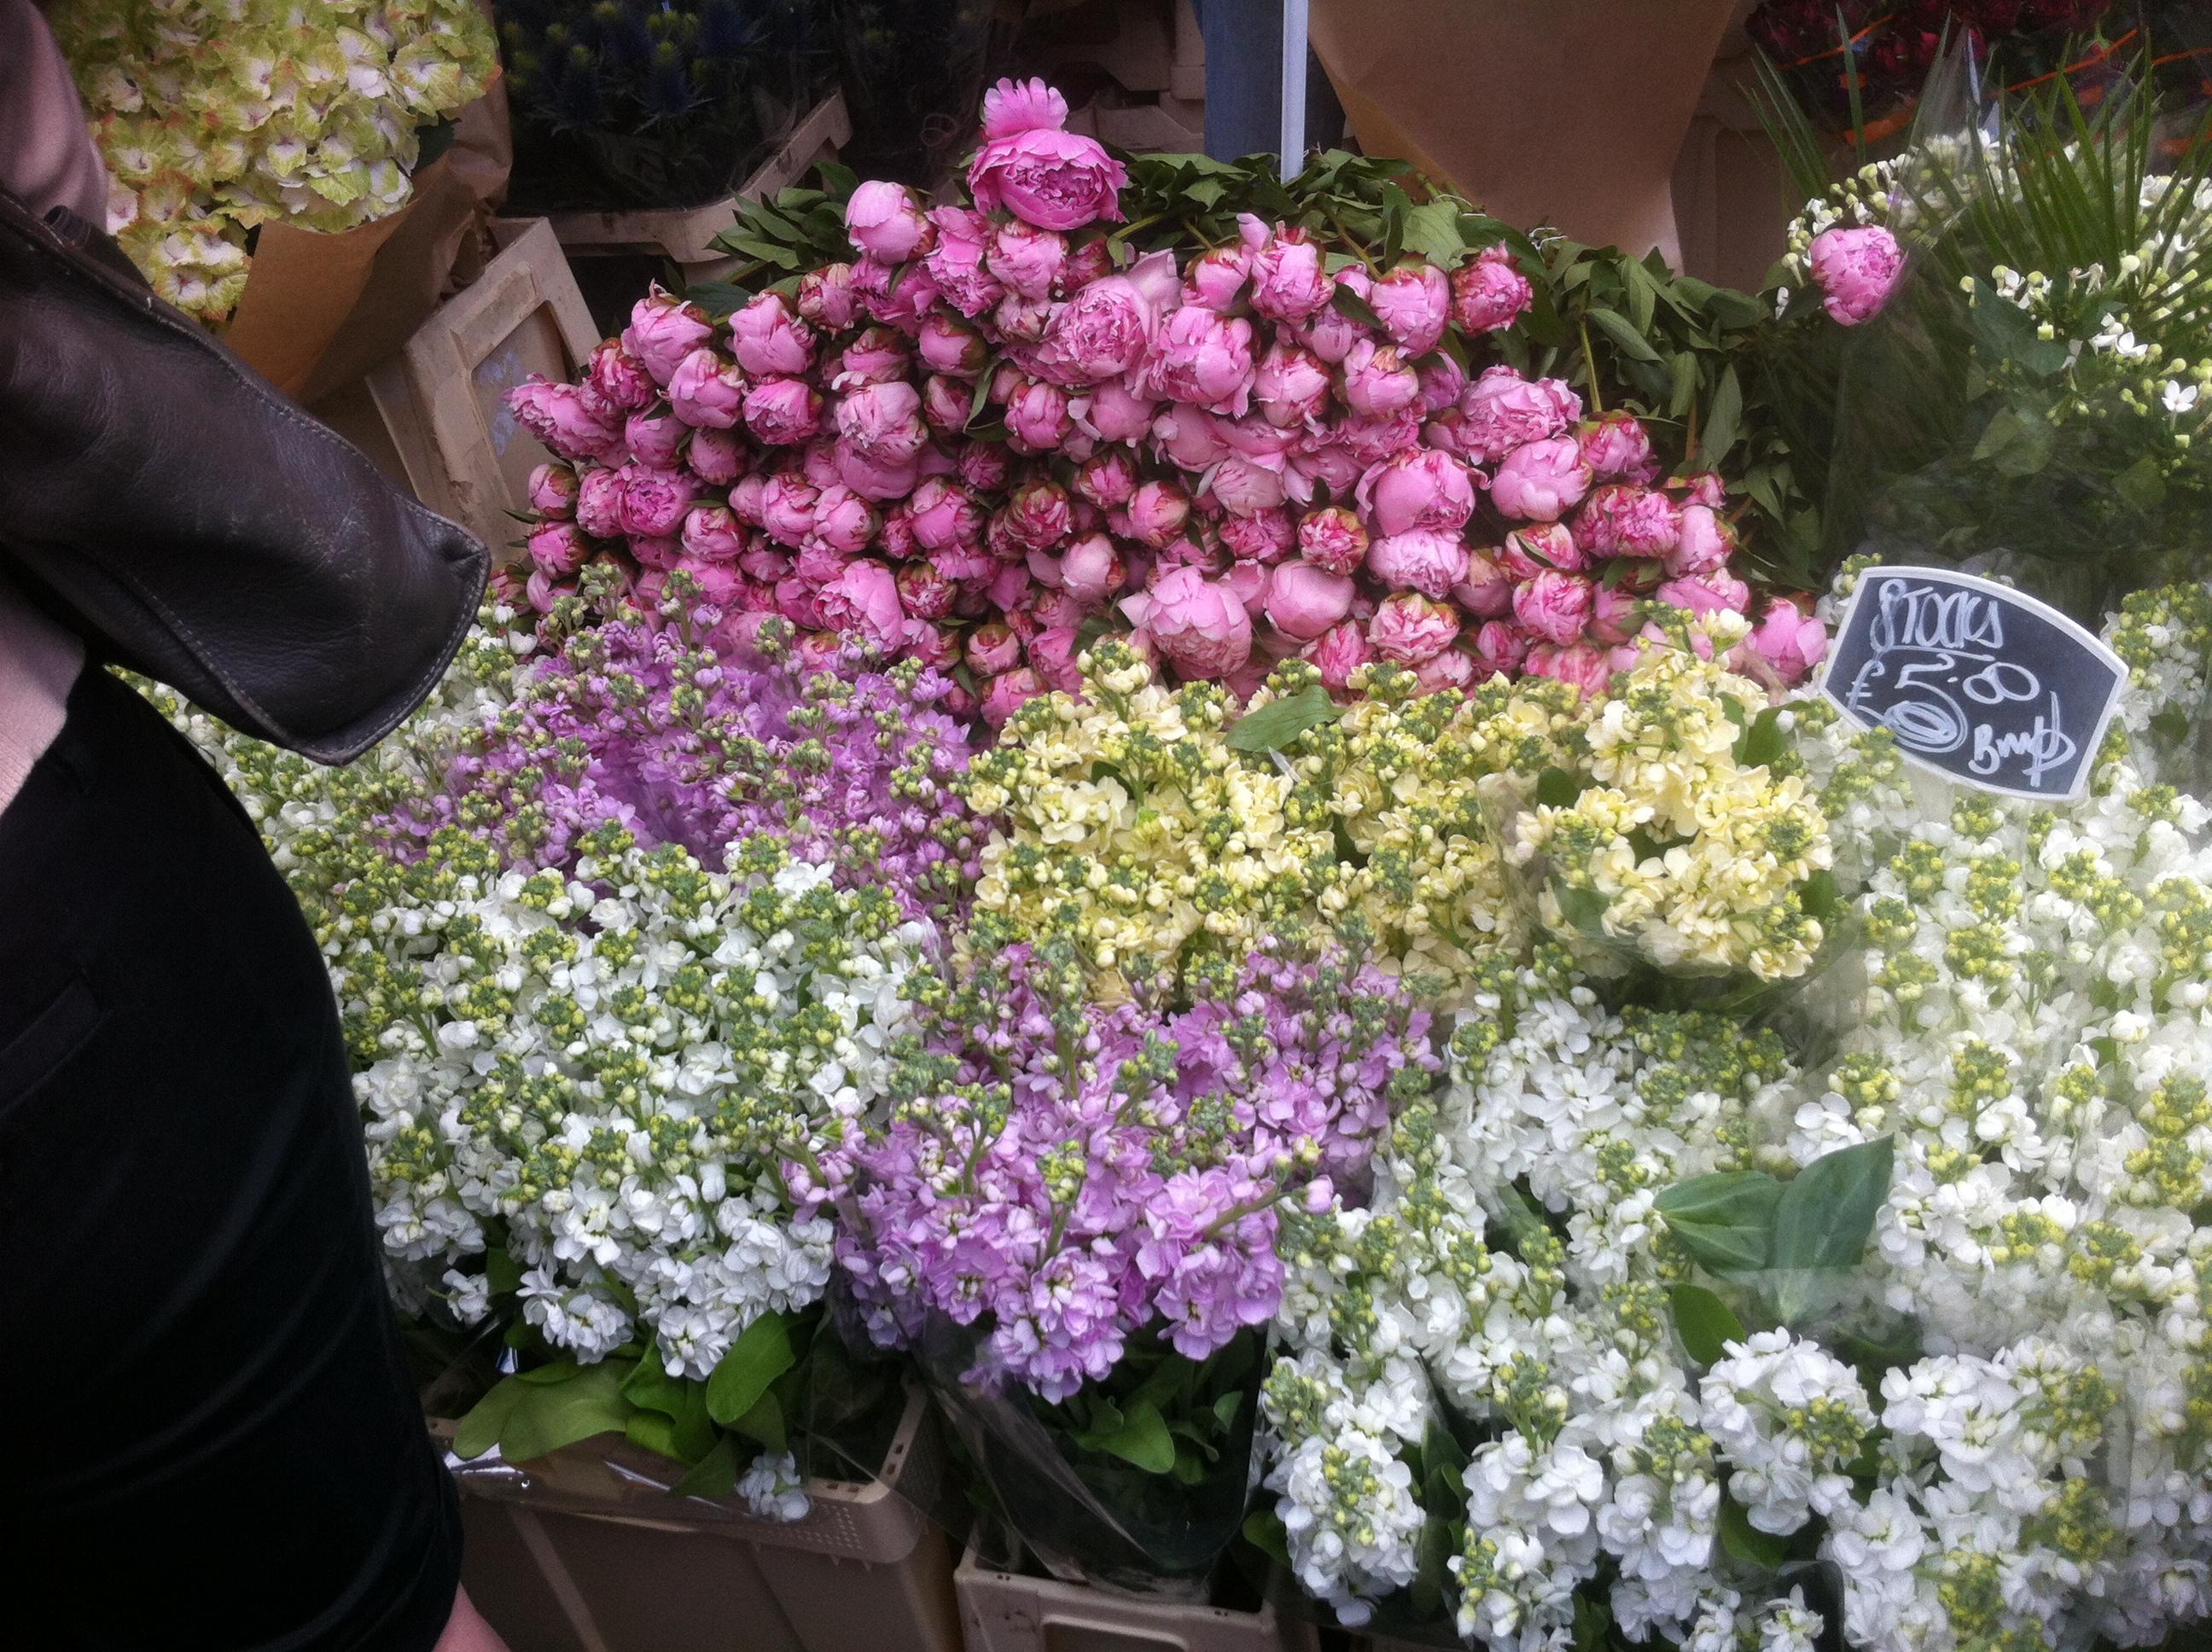 Columbia road flower market pleasure and payne img3304 mightylinksfo